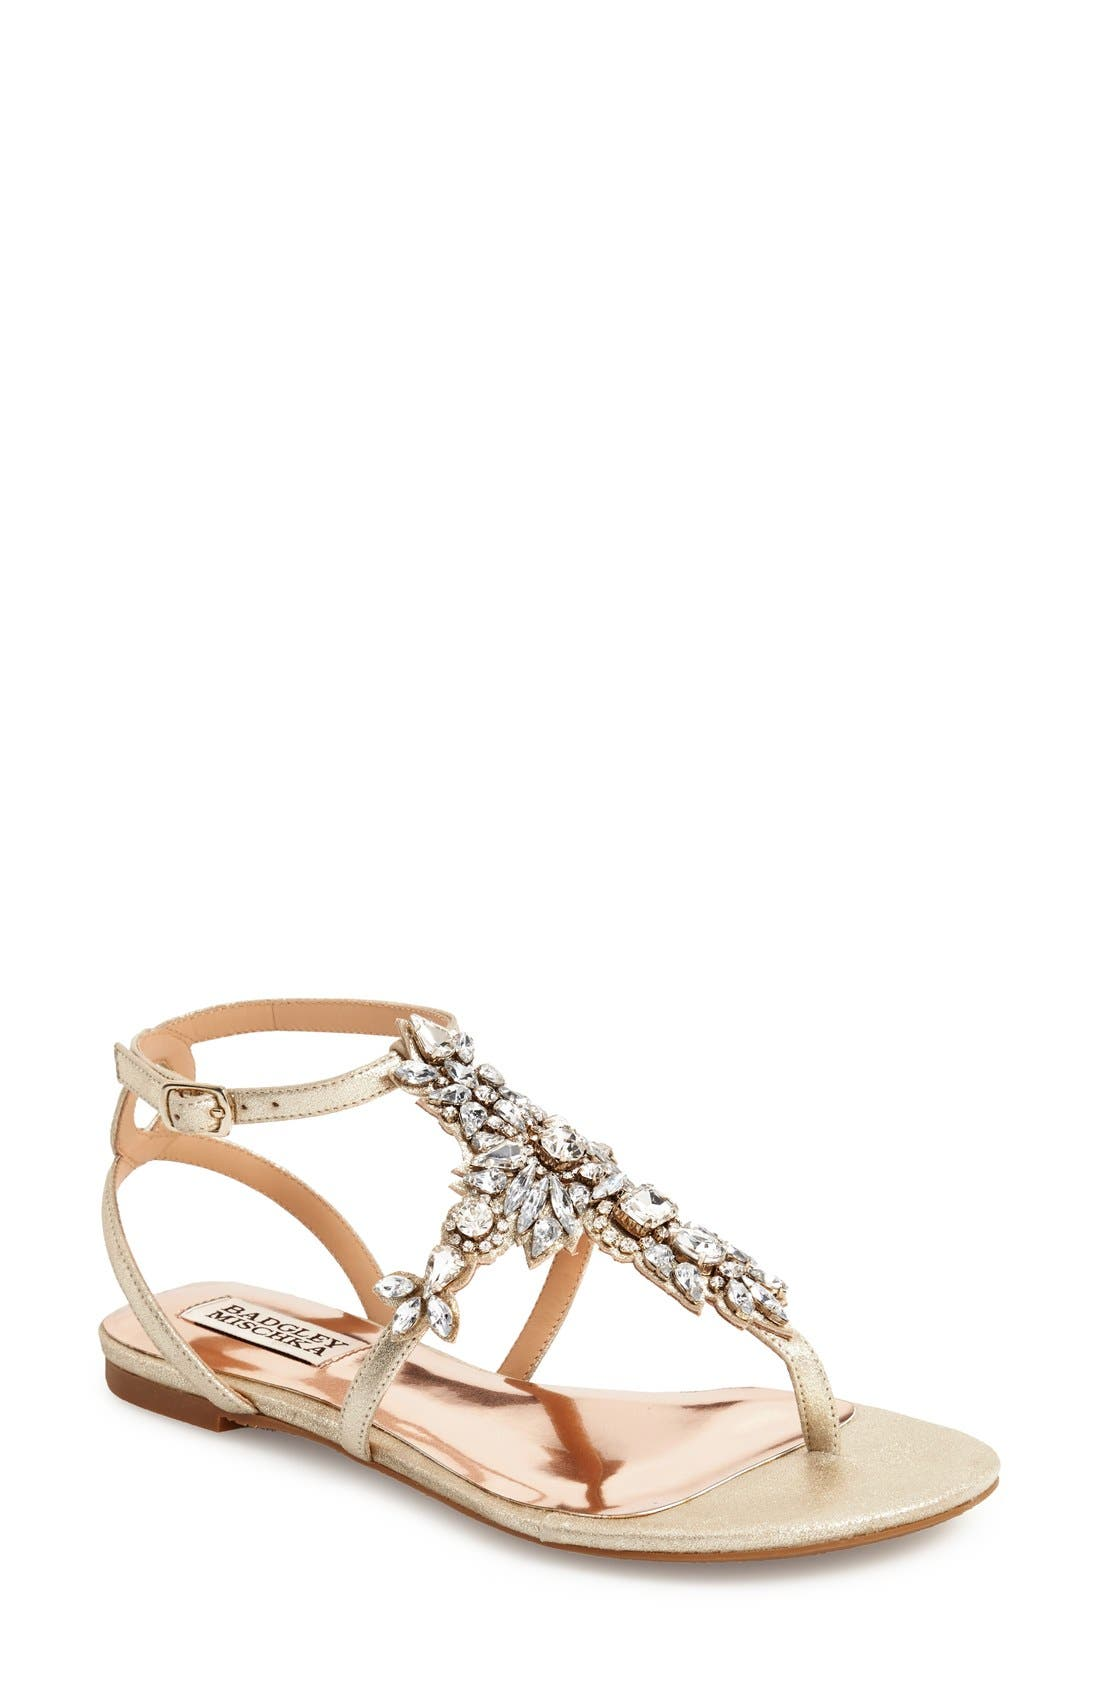 BADGLEY MISCHKA Cara Crystal Embellished Flat Sandal